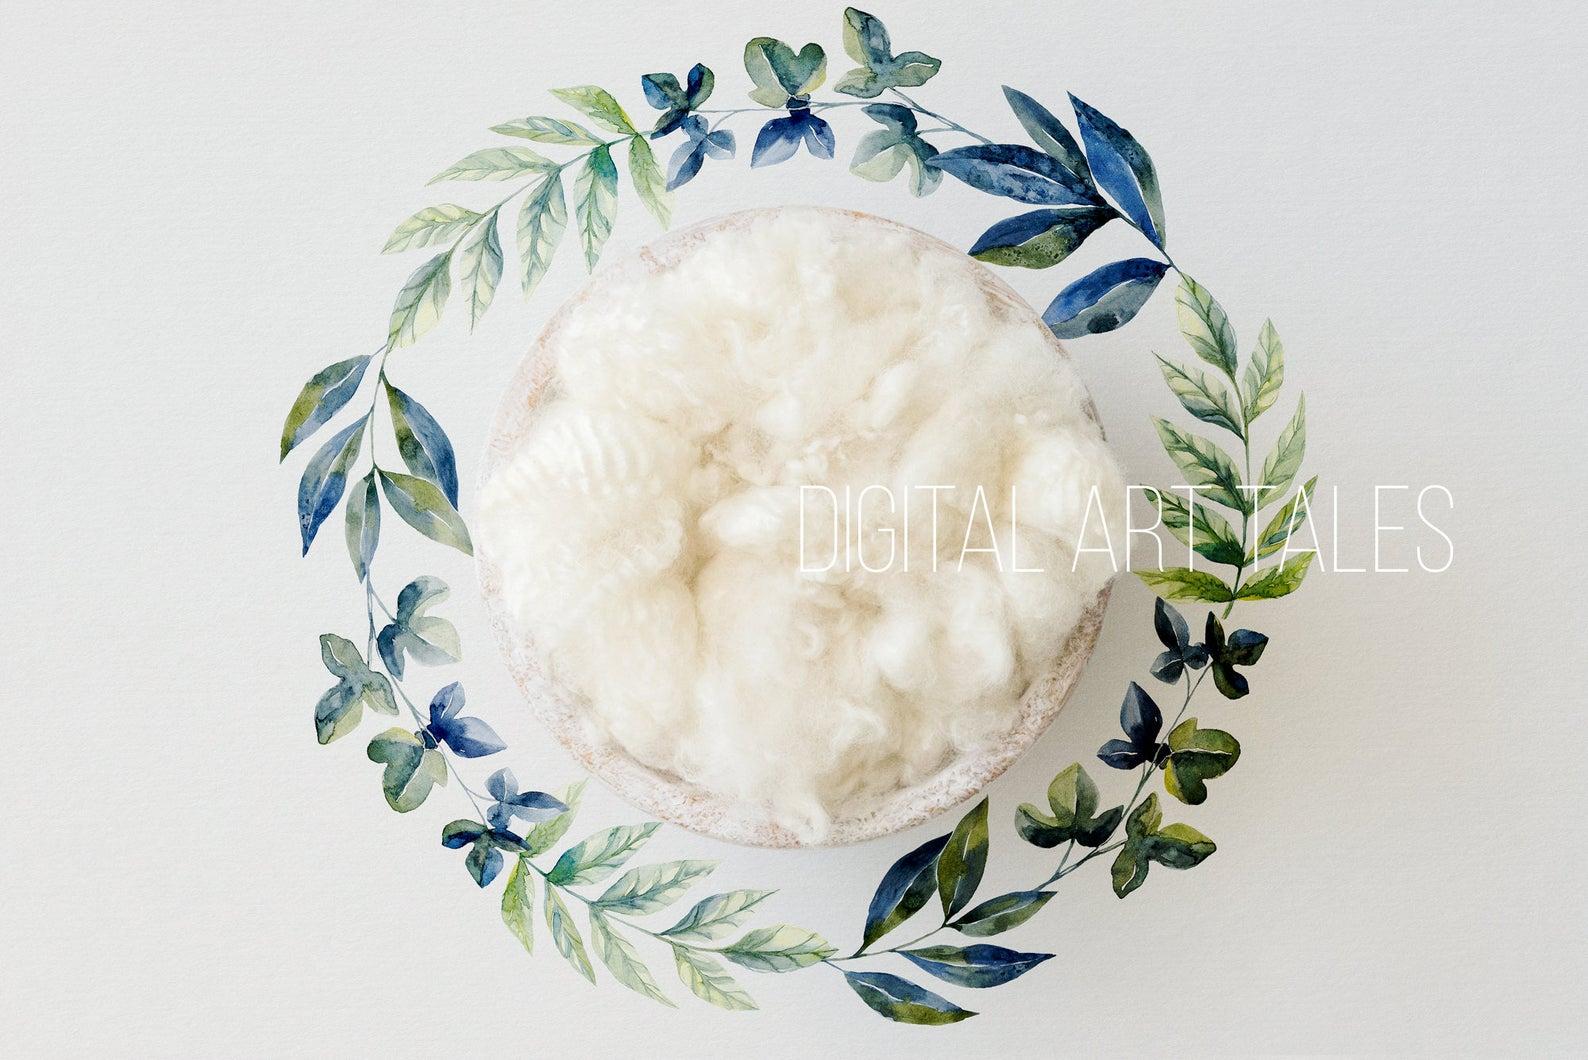 """Blue Watercolour Wreath"" Digital Backdrop"